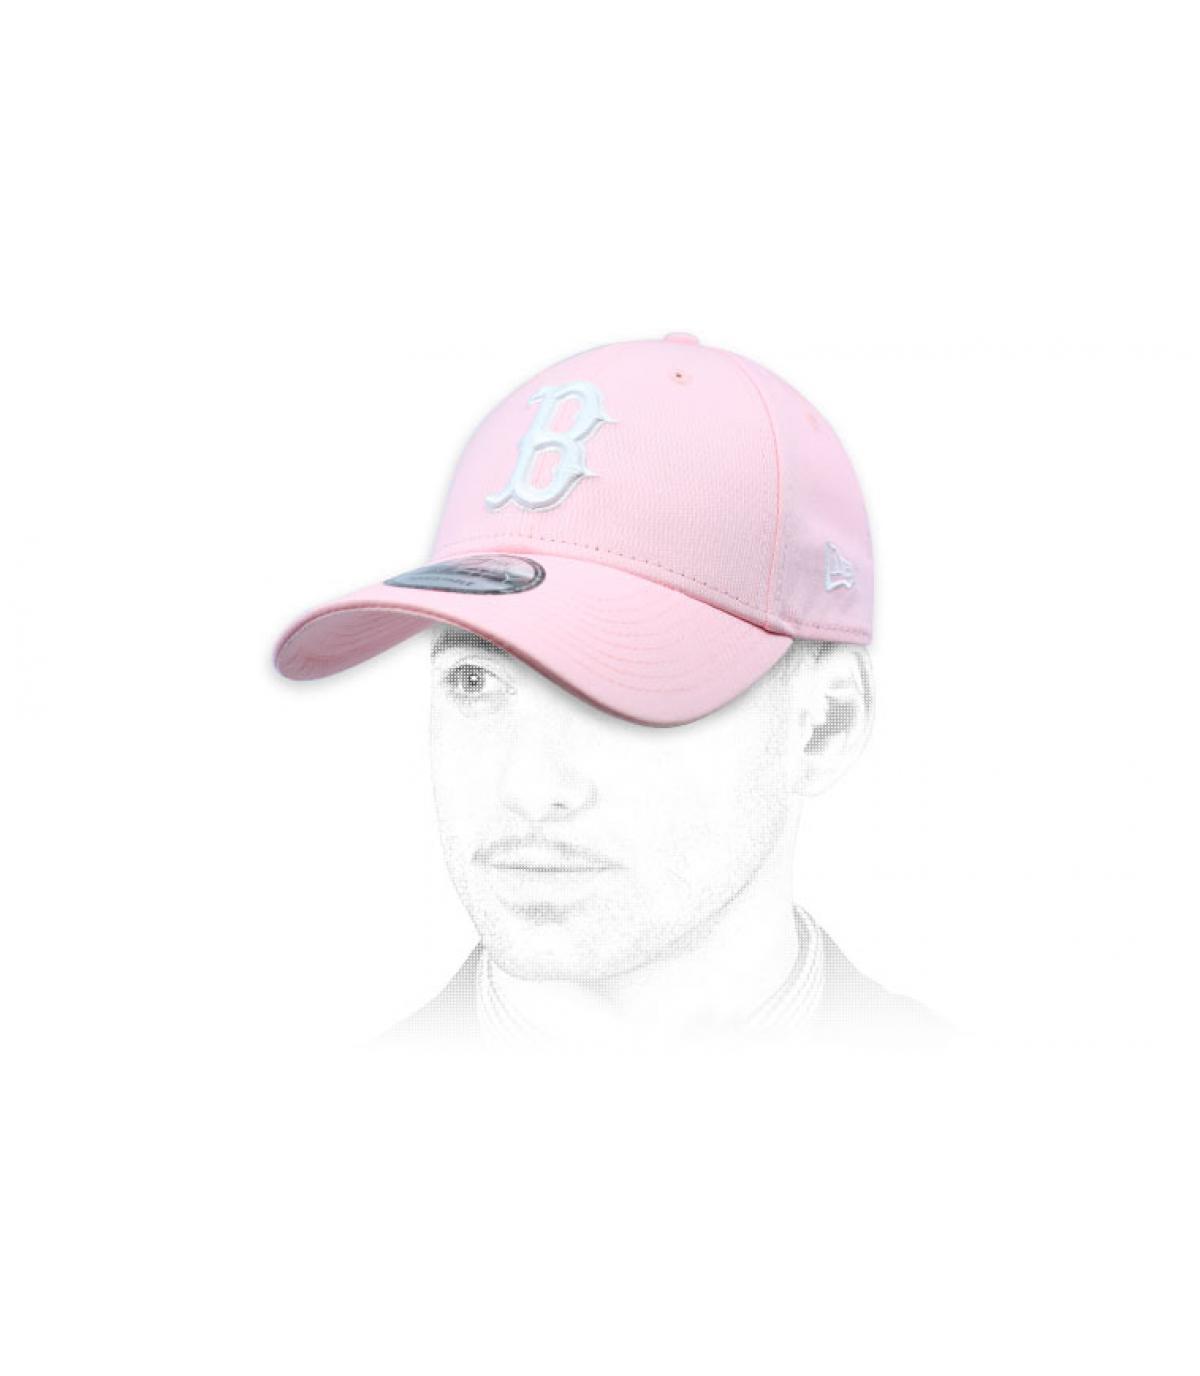 casquette B rose blanc